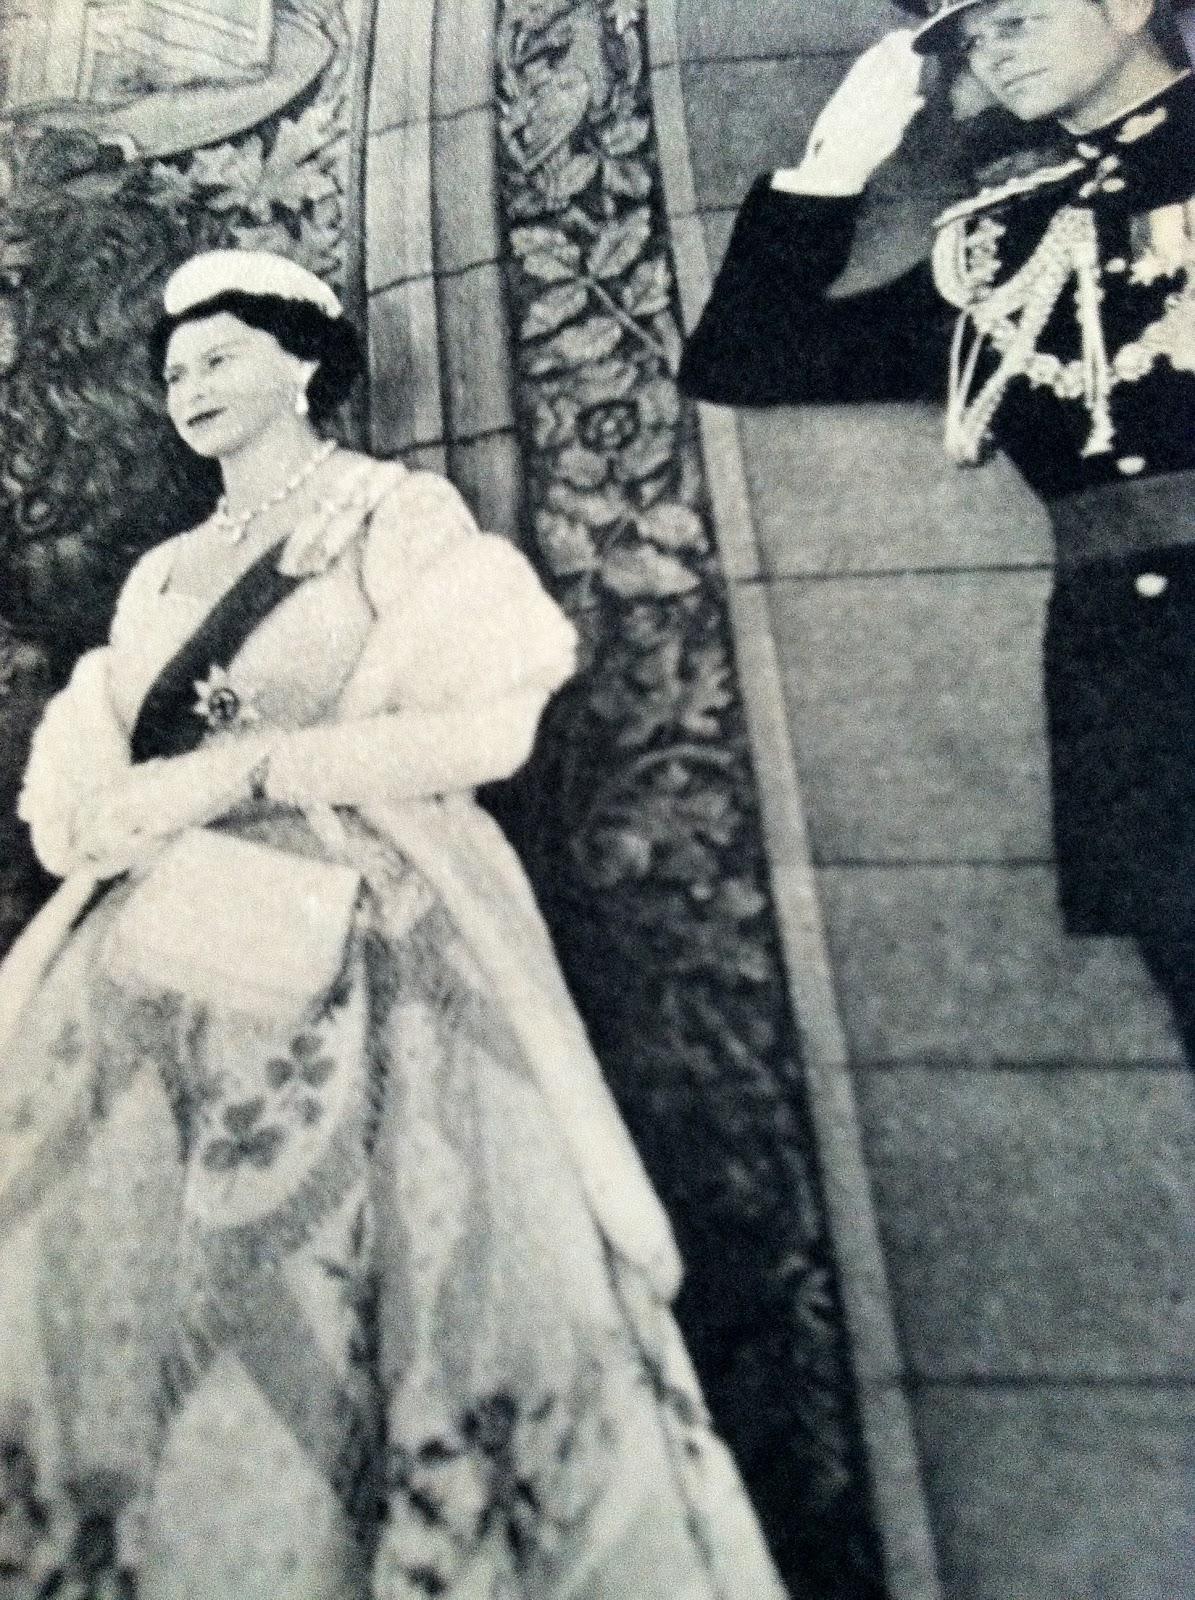 dronning elisabeth hunde